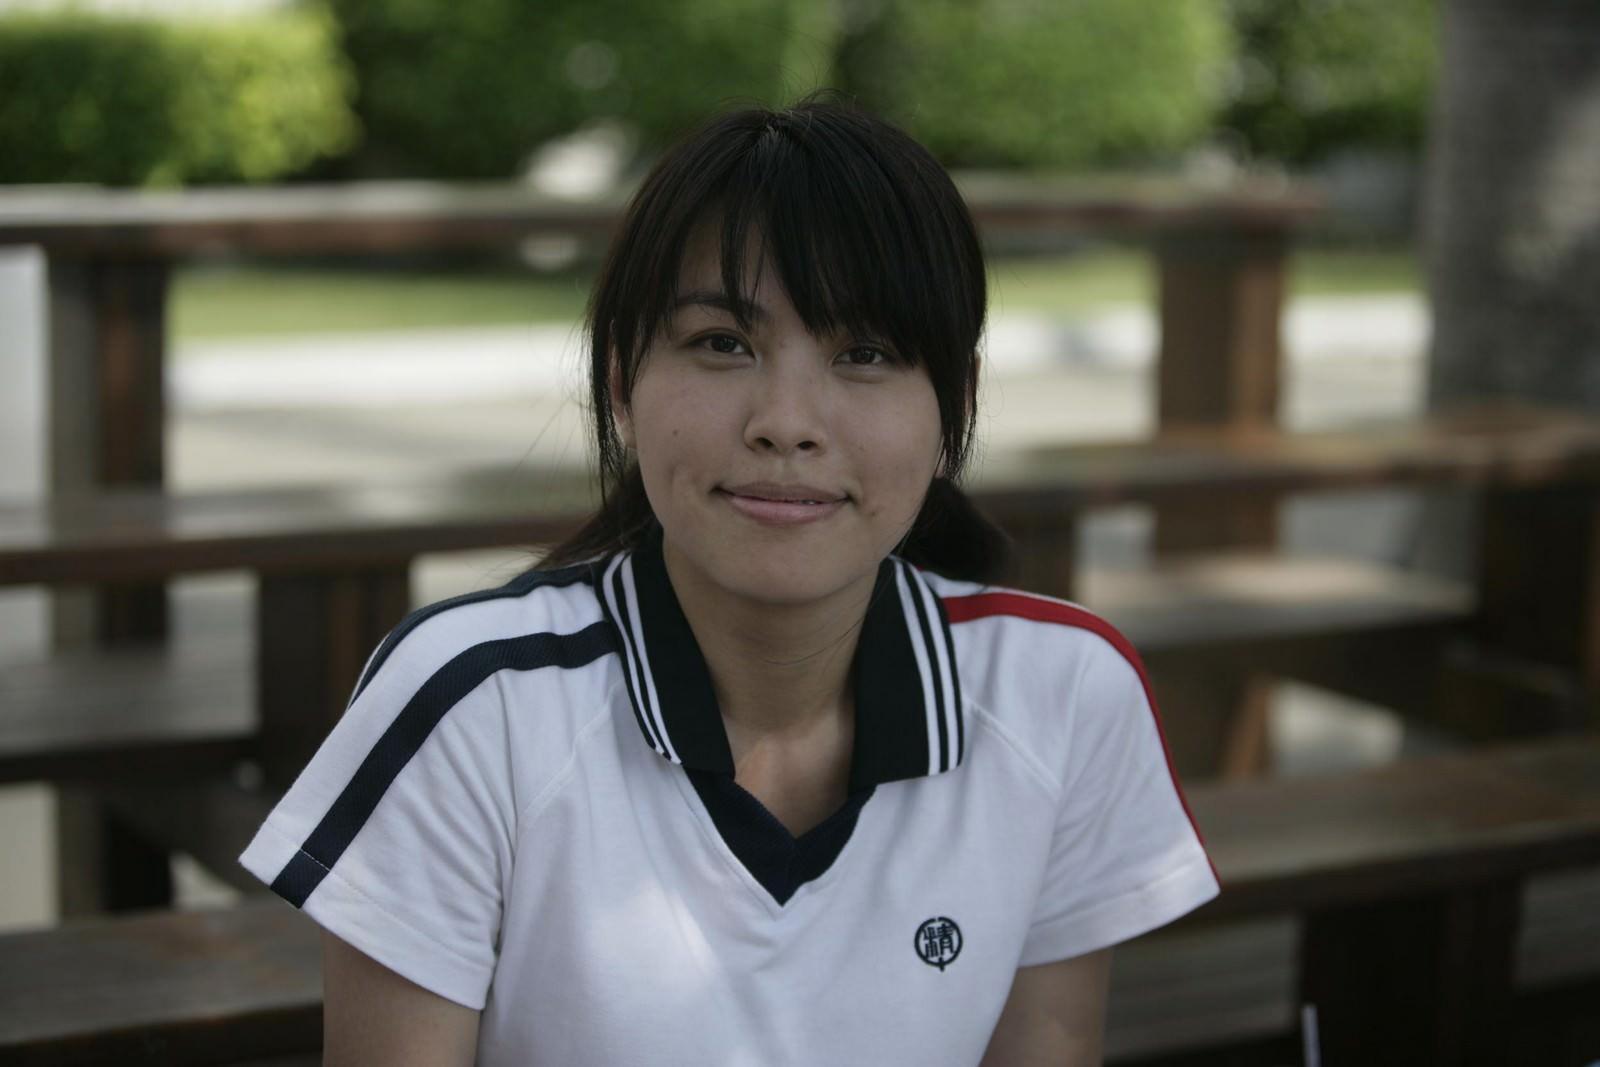 Movie, 那些年,我們一起追的女孩(台灣, 2011) / 那些年,我们一起追的女孩(中), You're The Apple Of My Eye(英文), 電影劇照